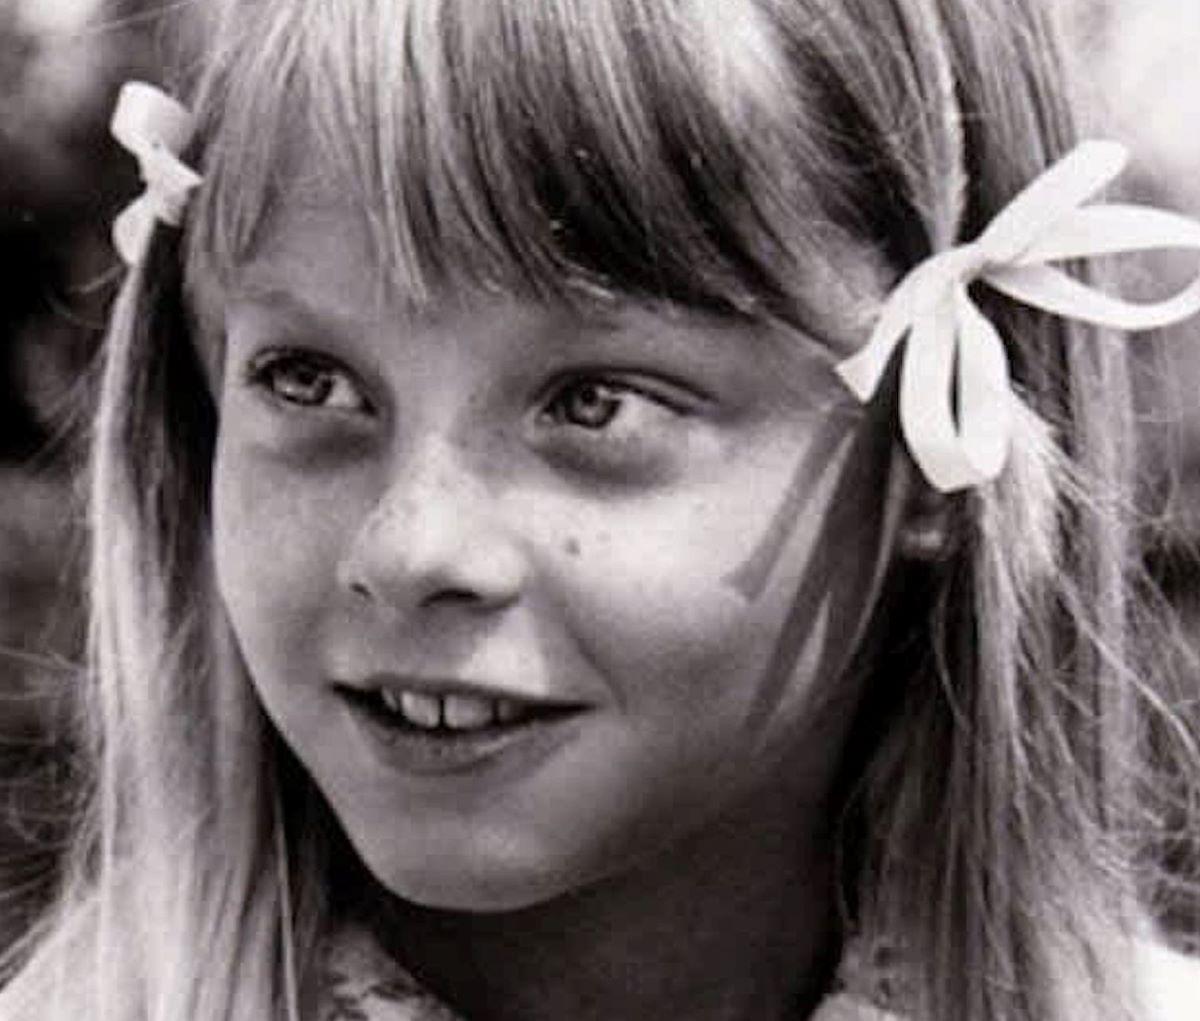 Jodie Foster Attrice Foto Bambina 12 anni